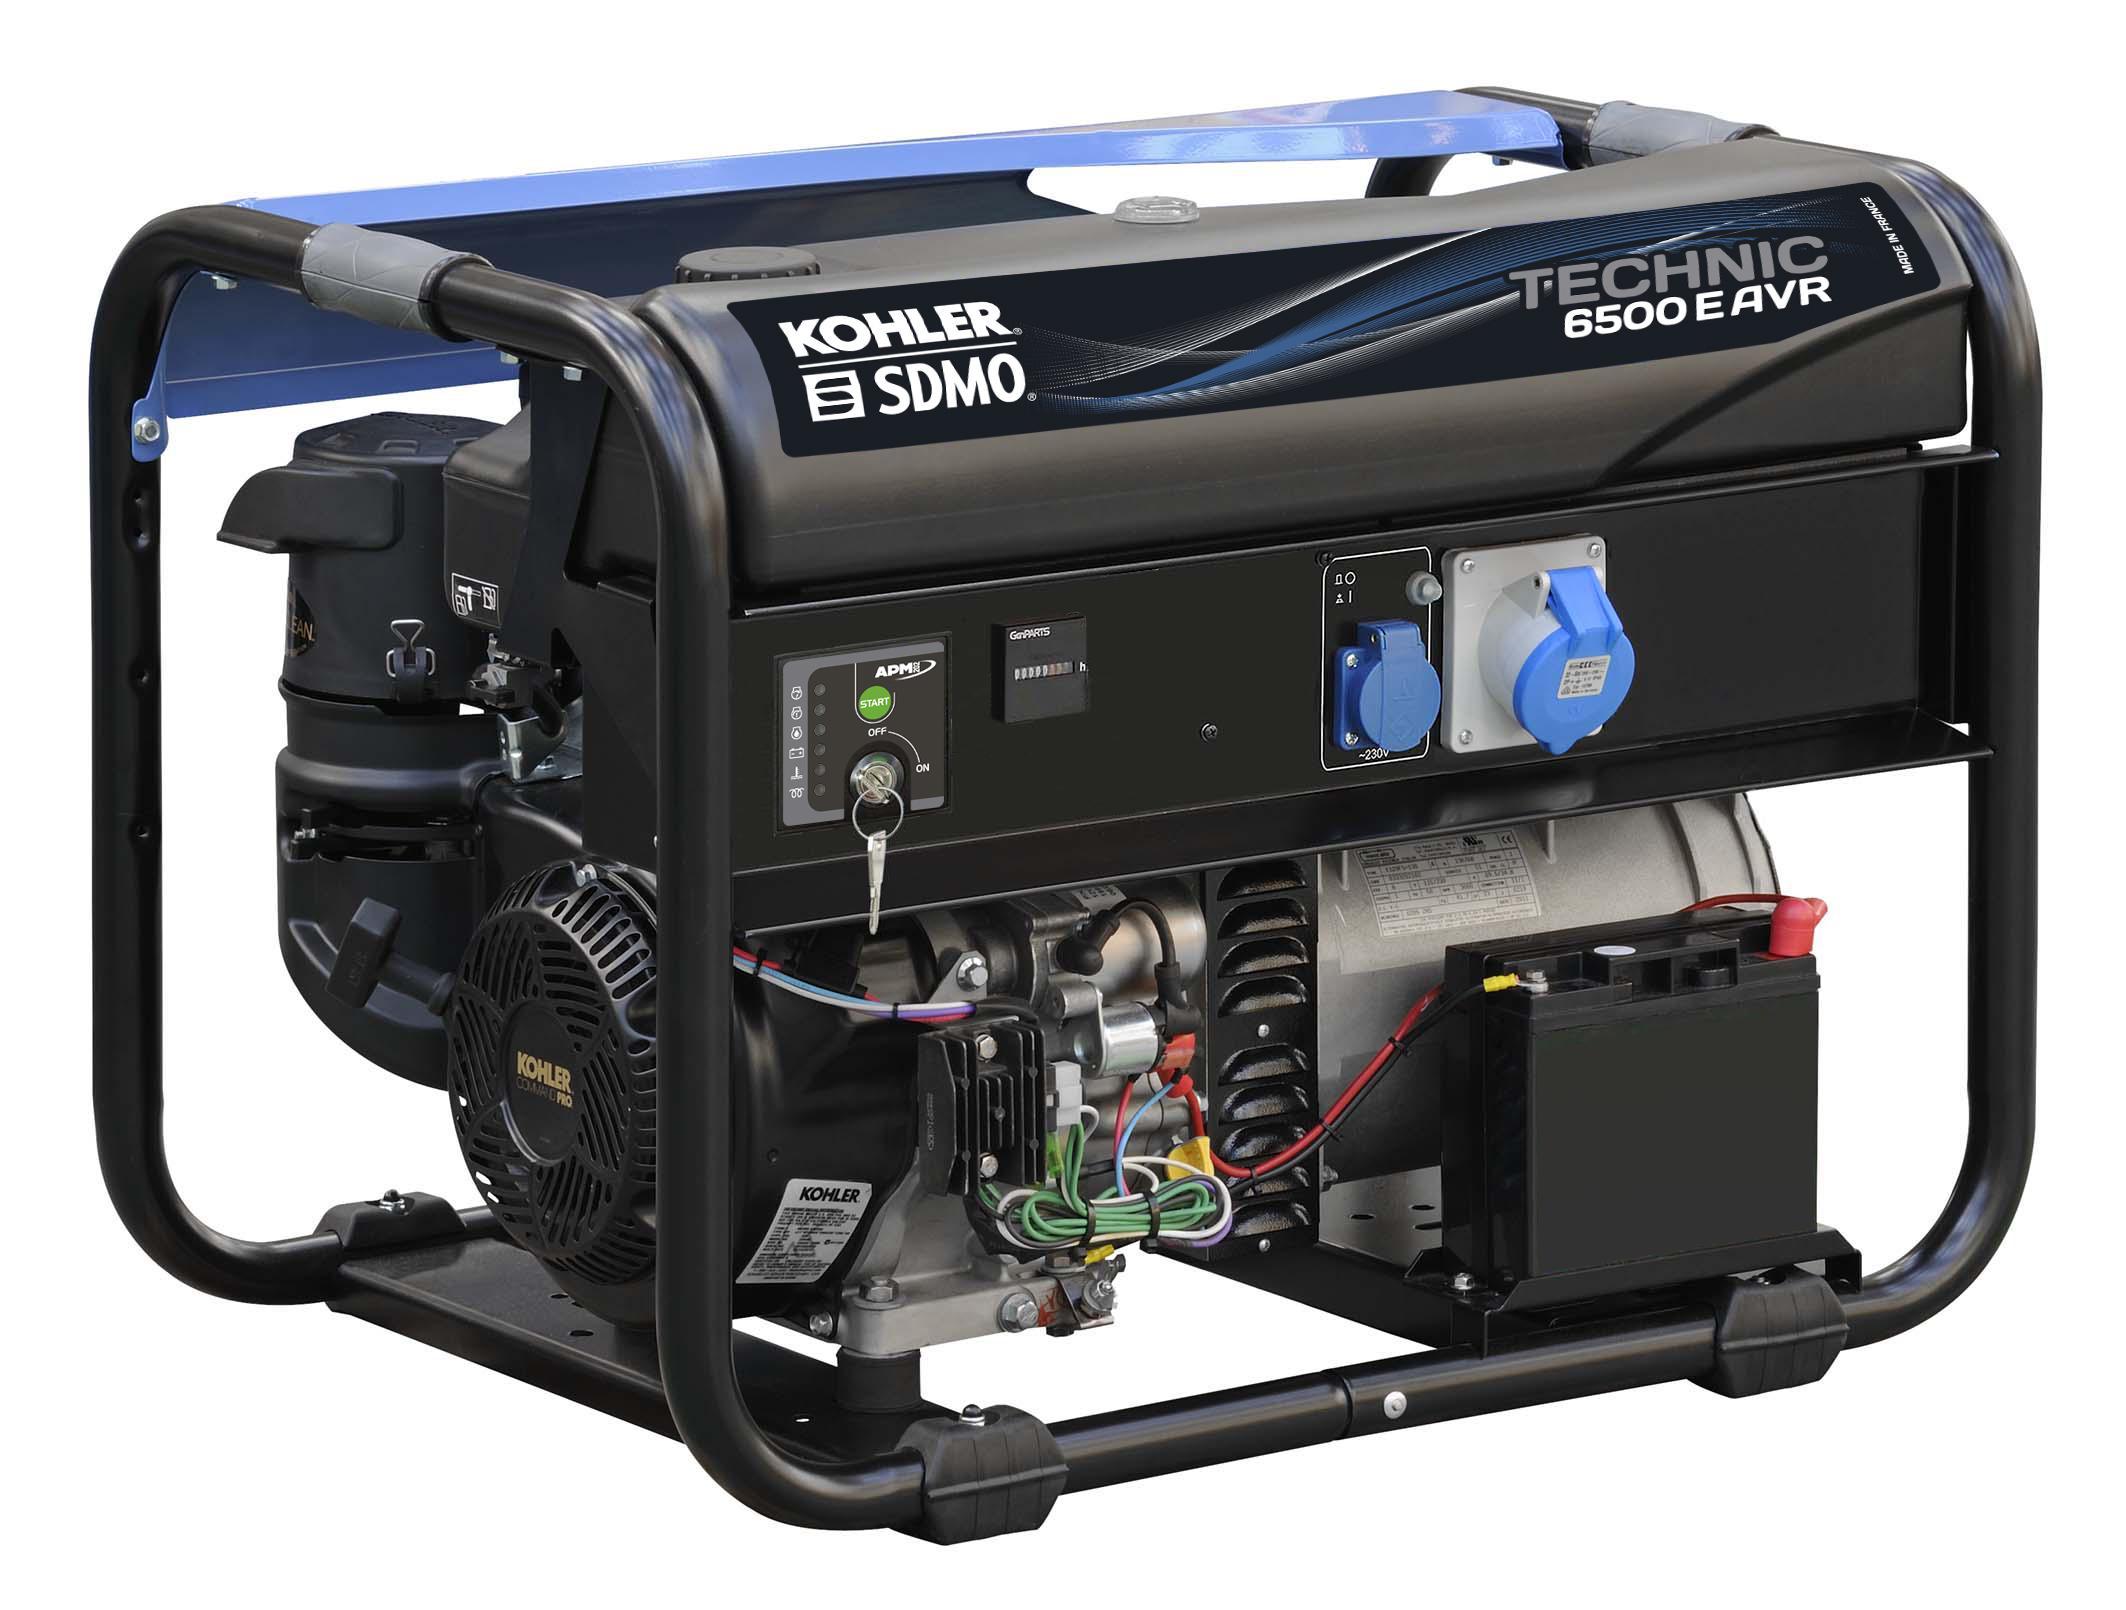 Бензиновый генератор Sdmo Technic 6500e avr m